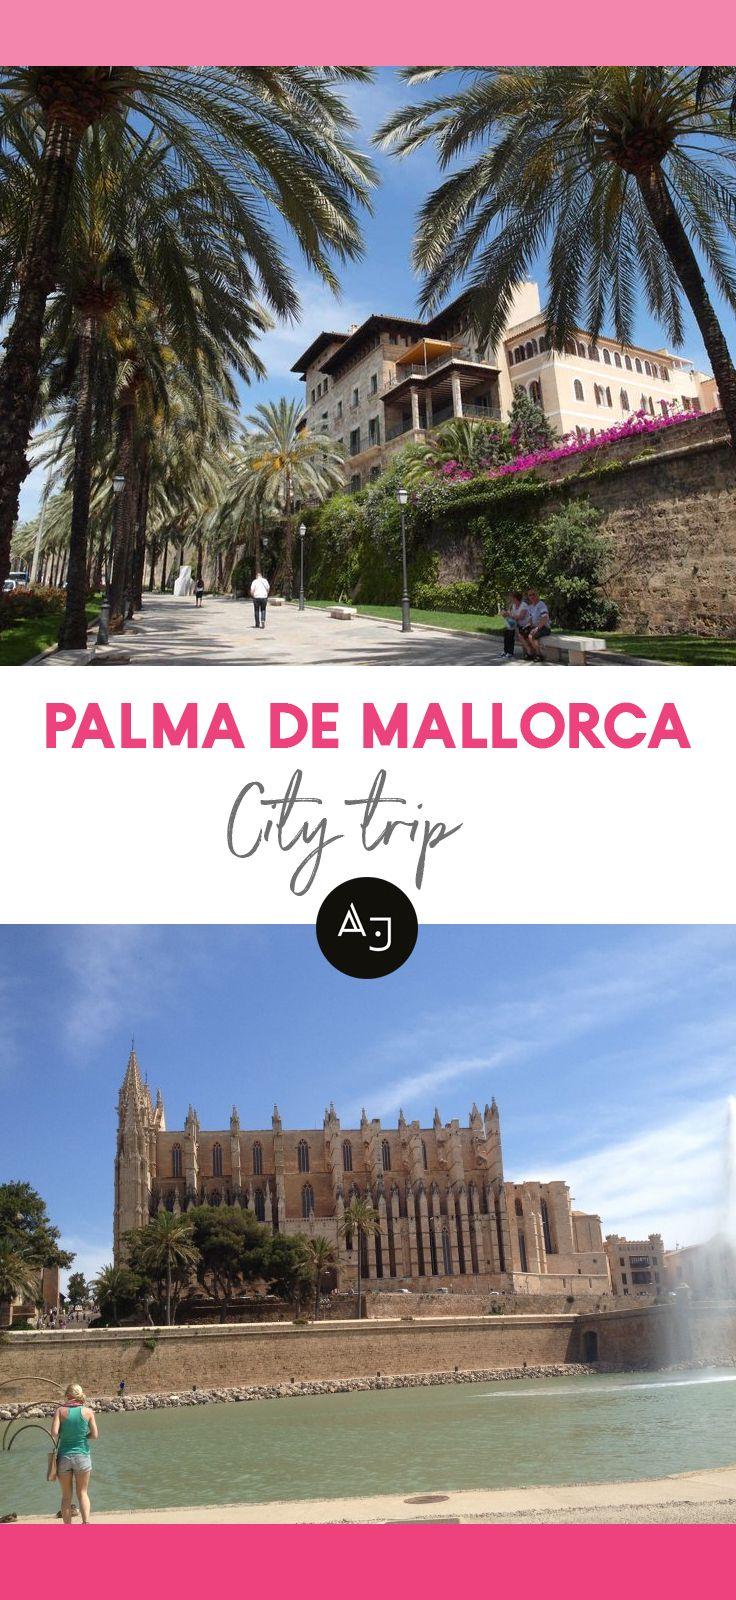 Hotel riu palace tres islas wellnesshotel strand van corralejo - Palma De Mallorca Is A Great City Trip The Best Places To Visit Eat